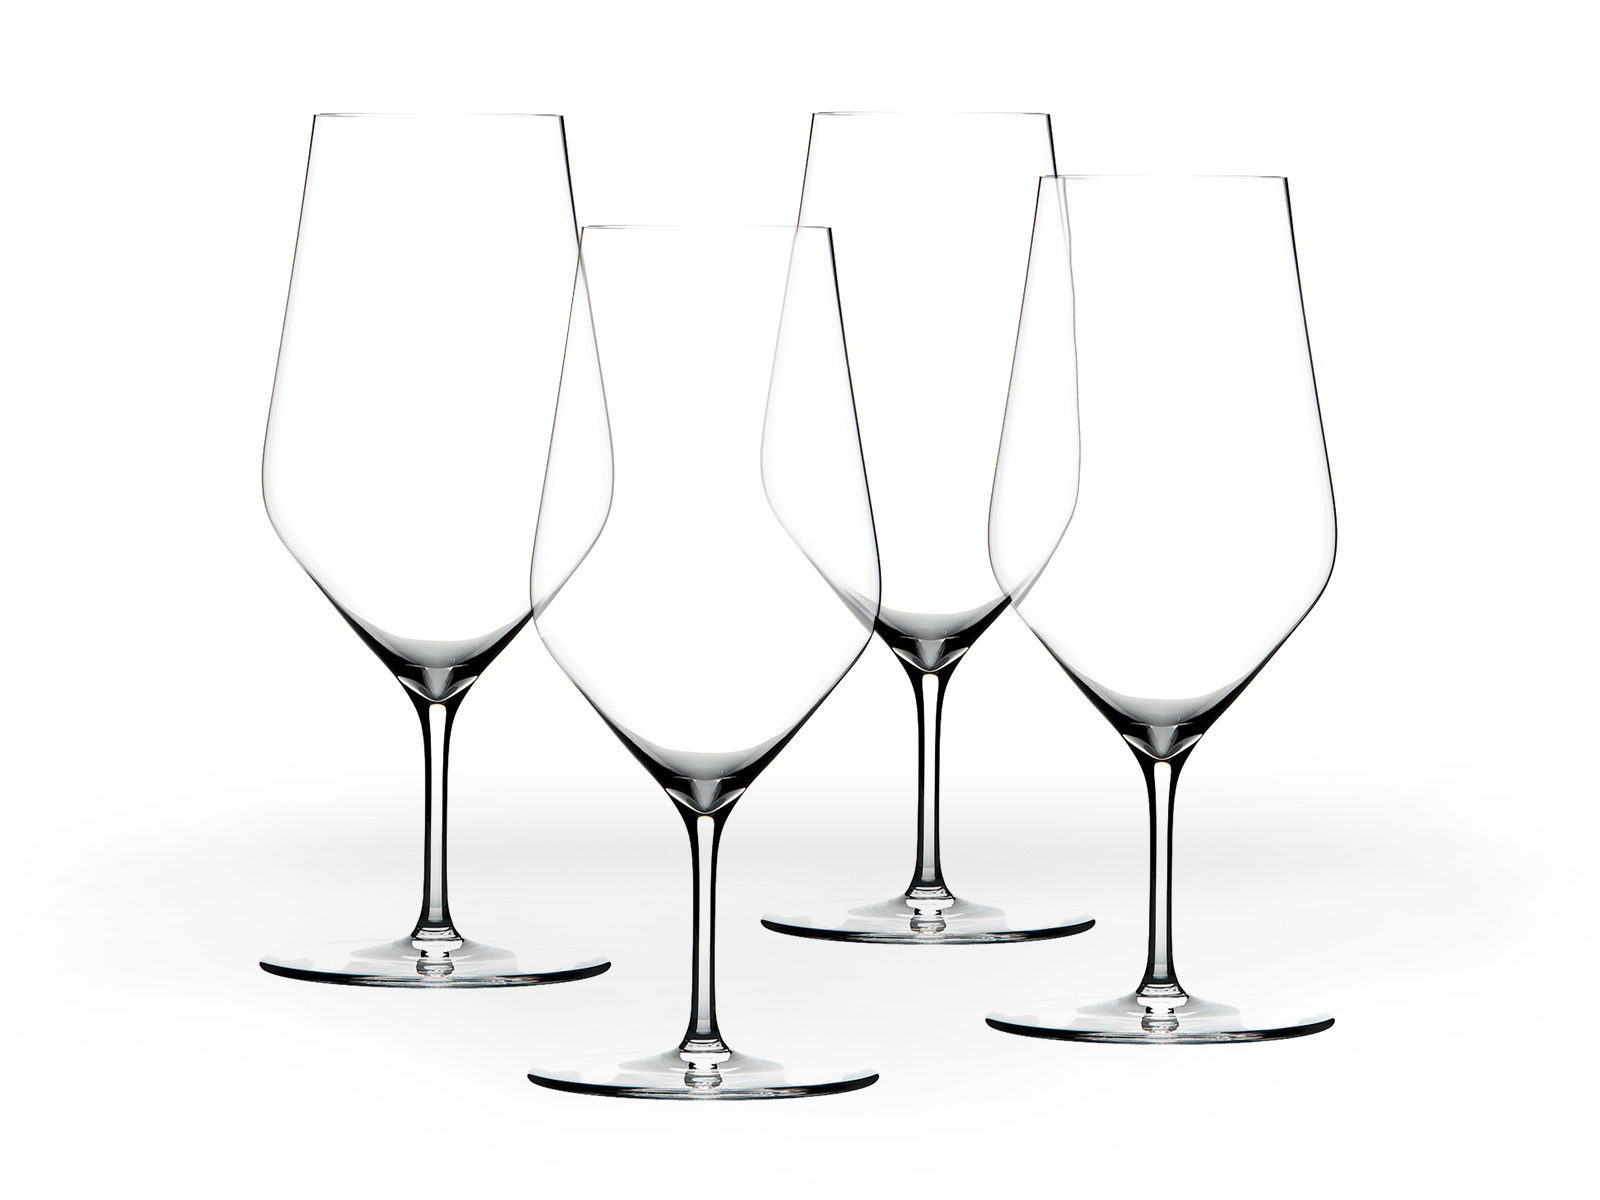 Zalto-Wine-Monger-Water-Glass-4-1600x1200_sku_cropped_1600x1200_q95_58fc16